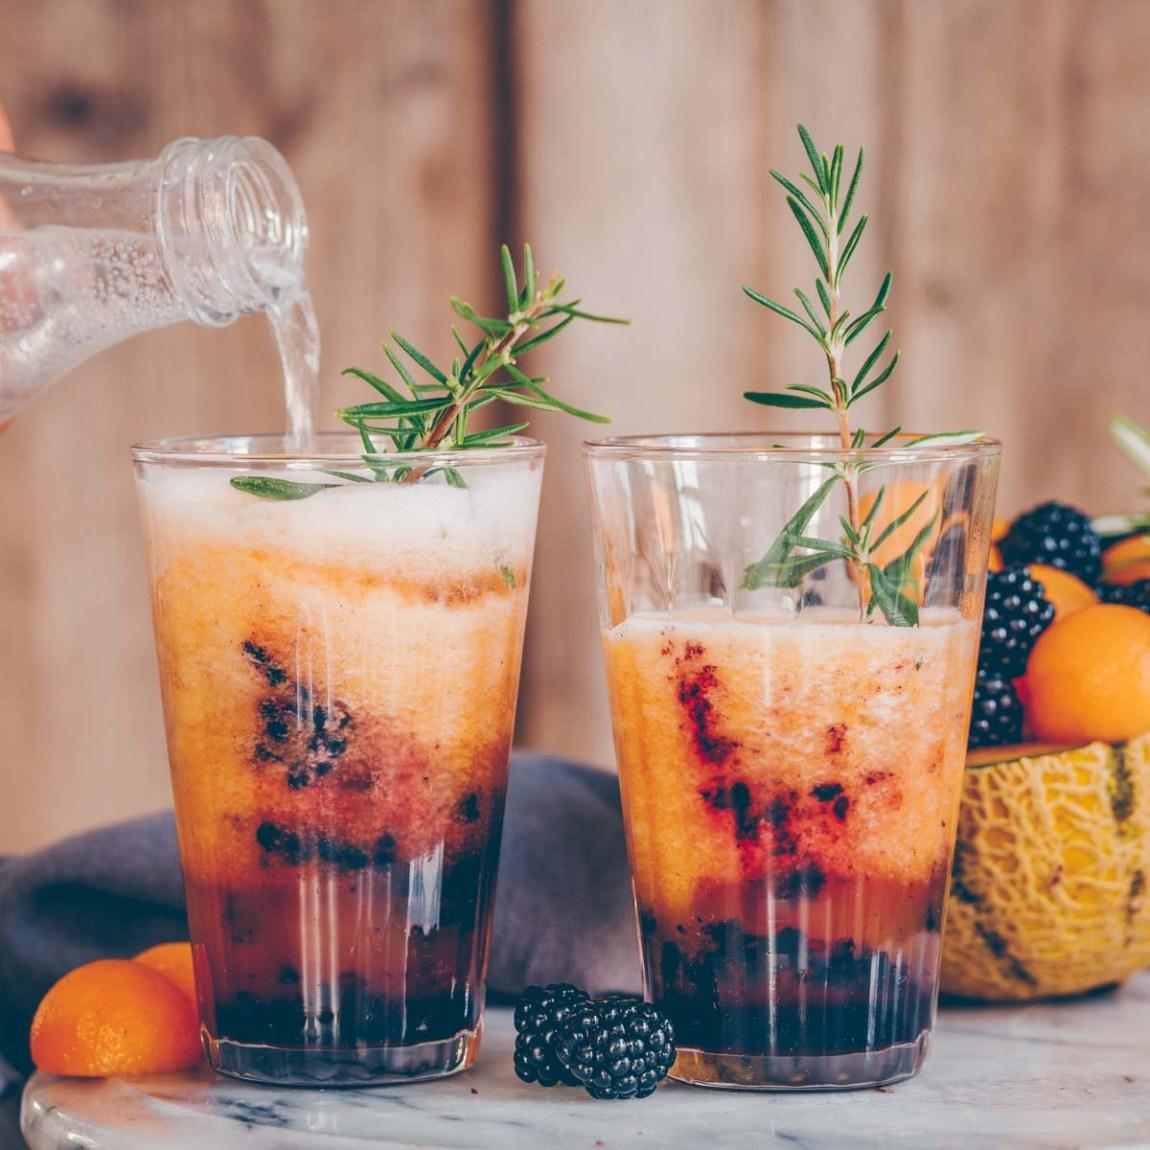 Blackberry Melon Cocktail